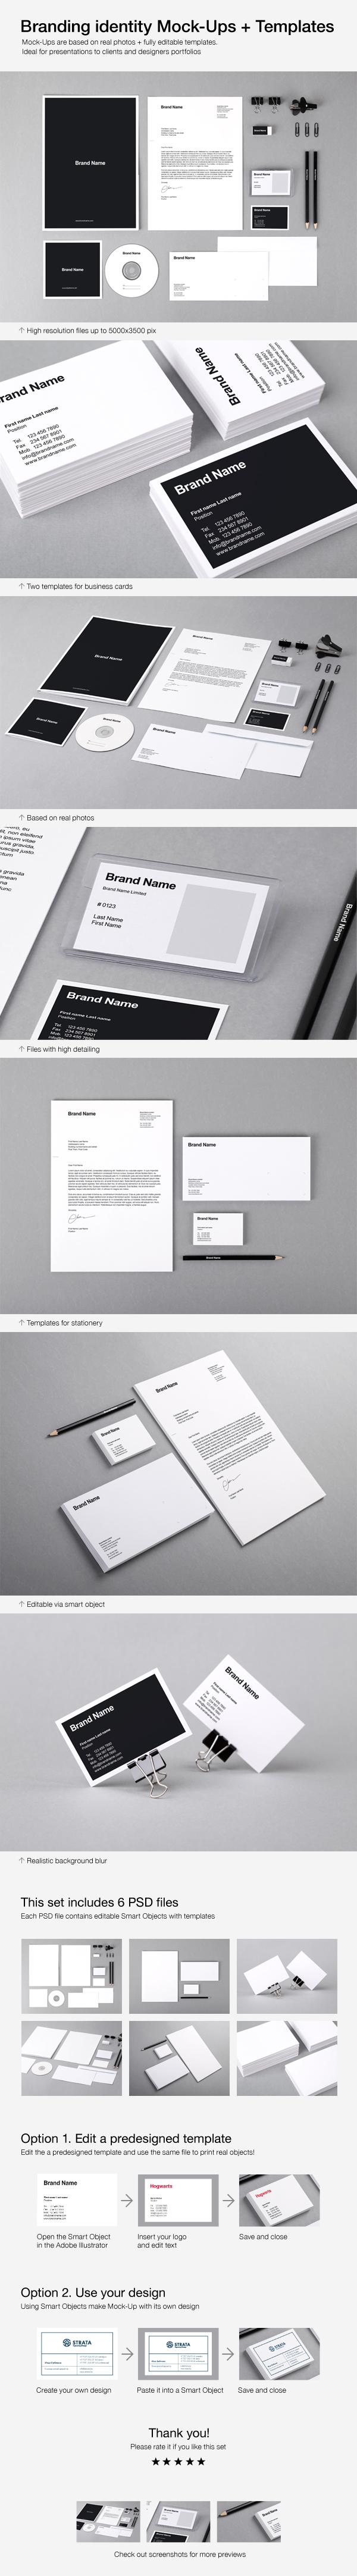 Branding Identity Mock Ups and Templates by Vitaly Stepanenko on